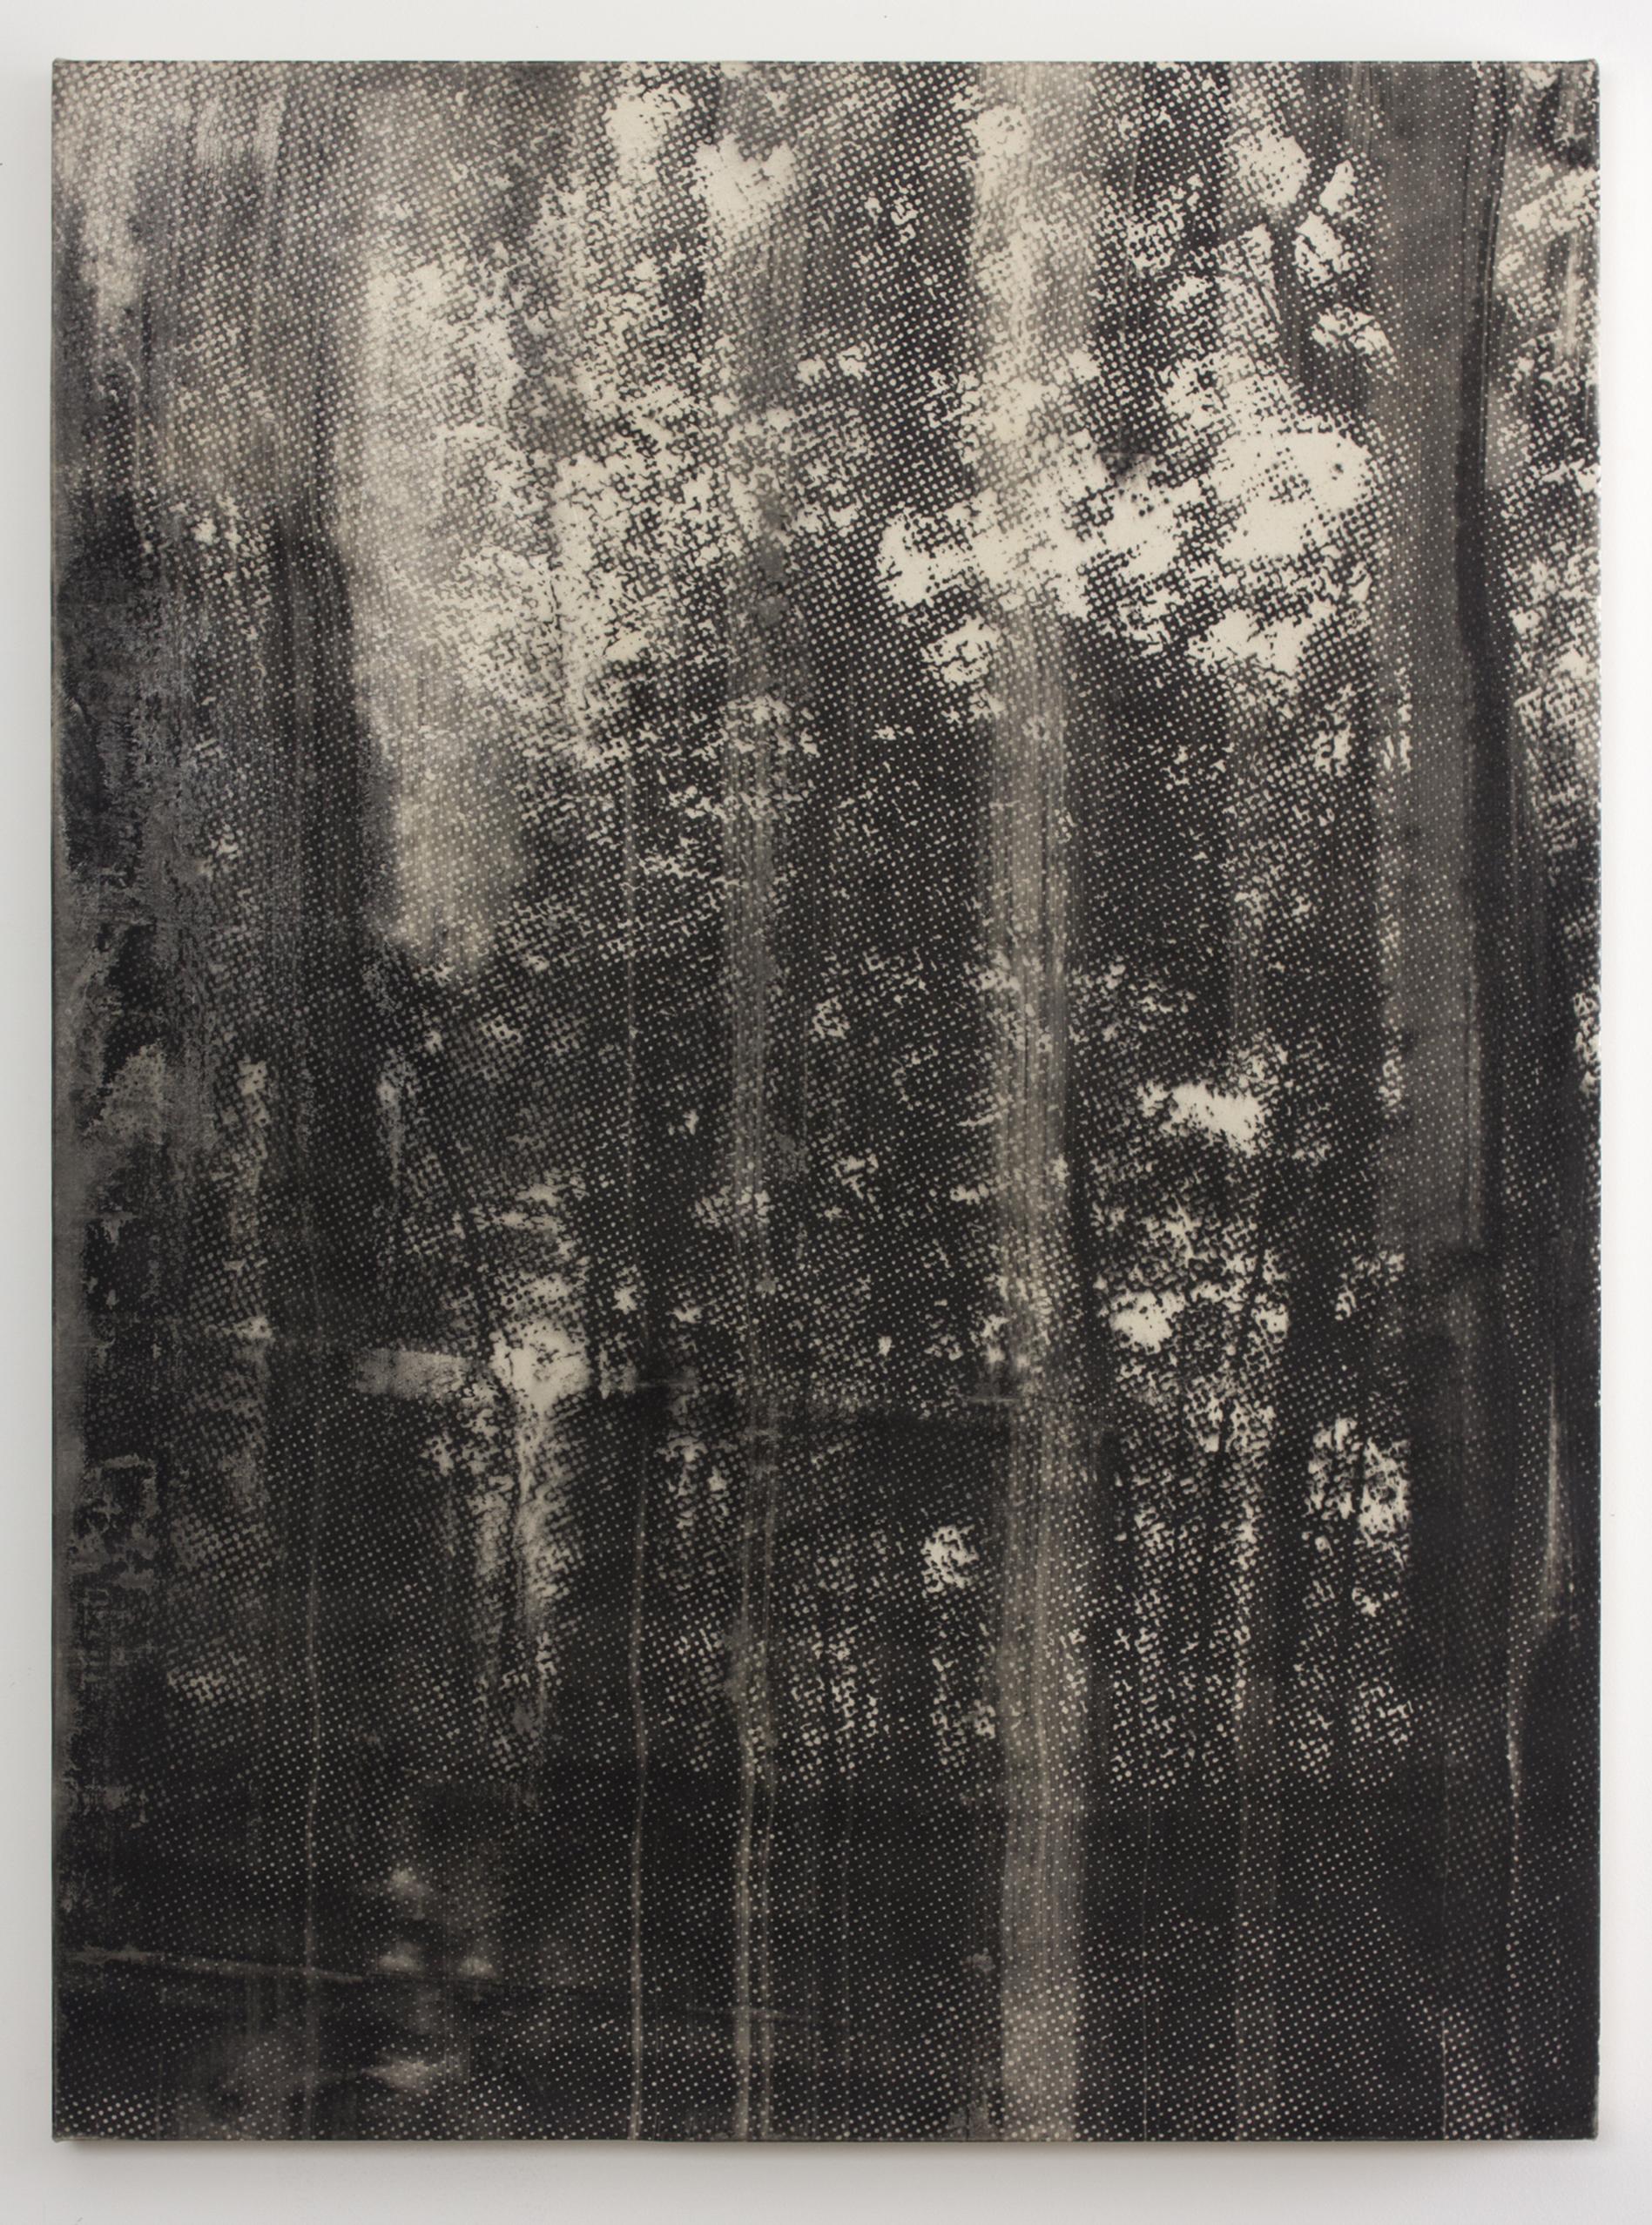 Landscape No. 8 , 2015 copy-machine toner on canvas 36 x 48 in